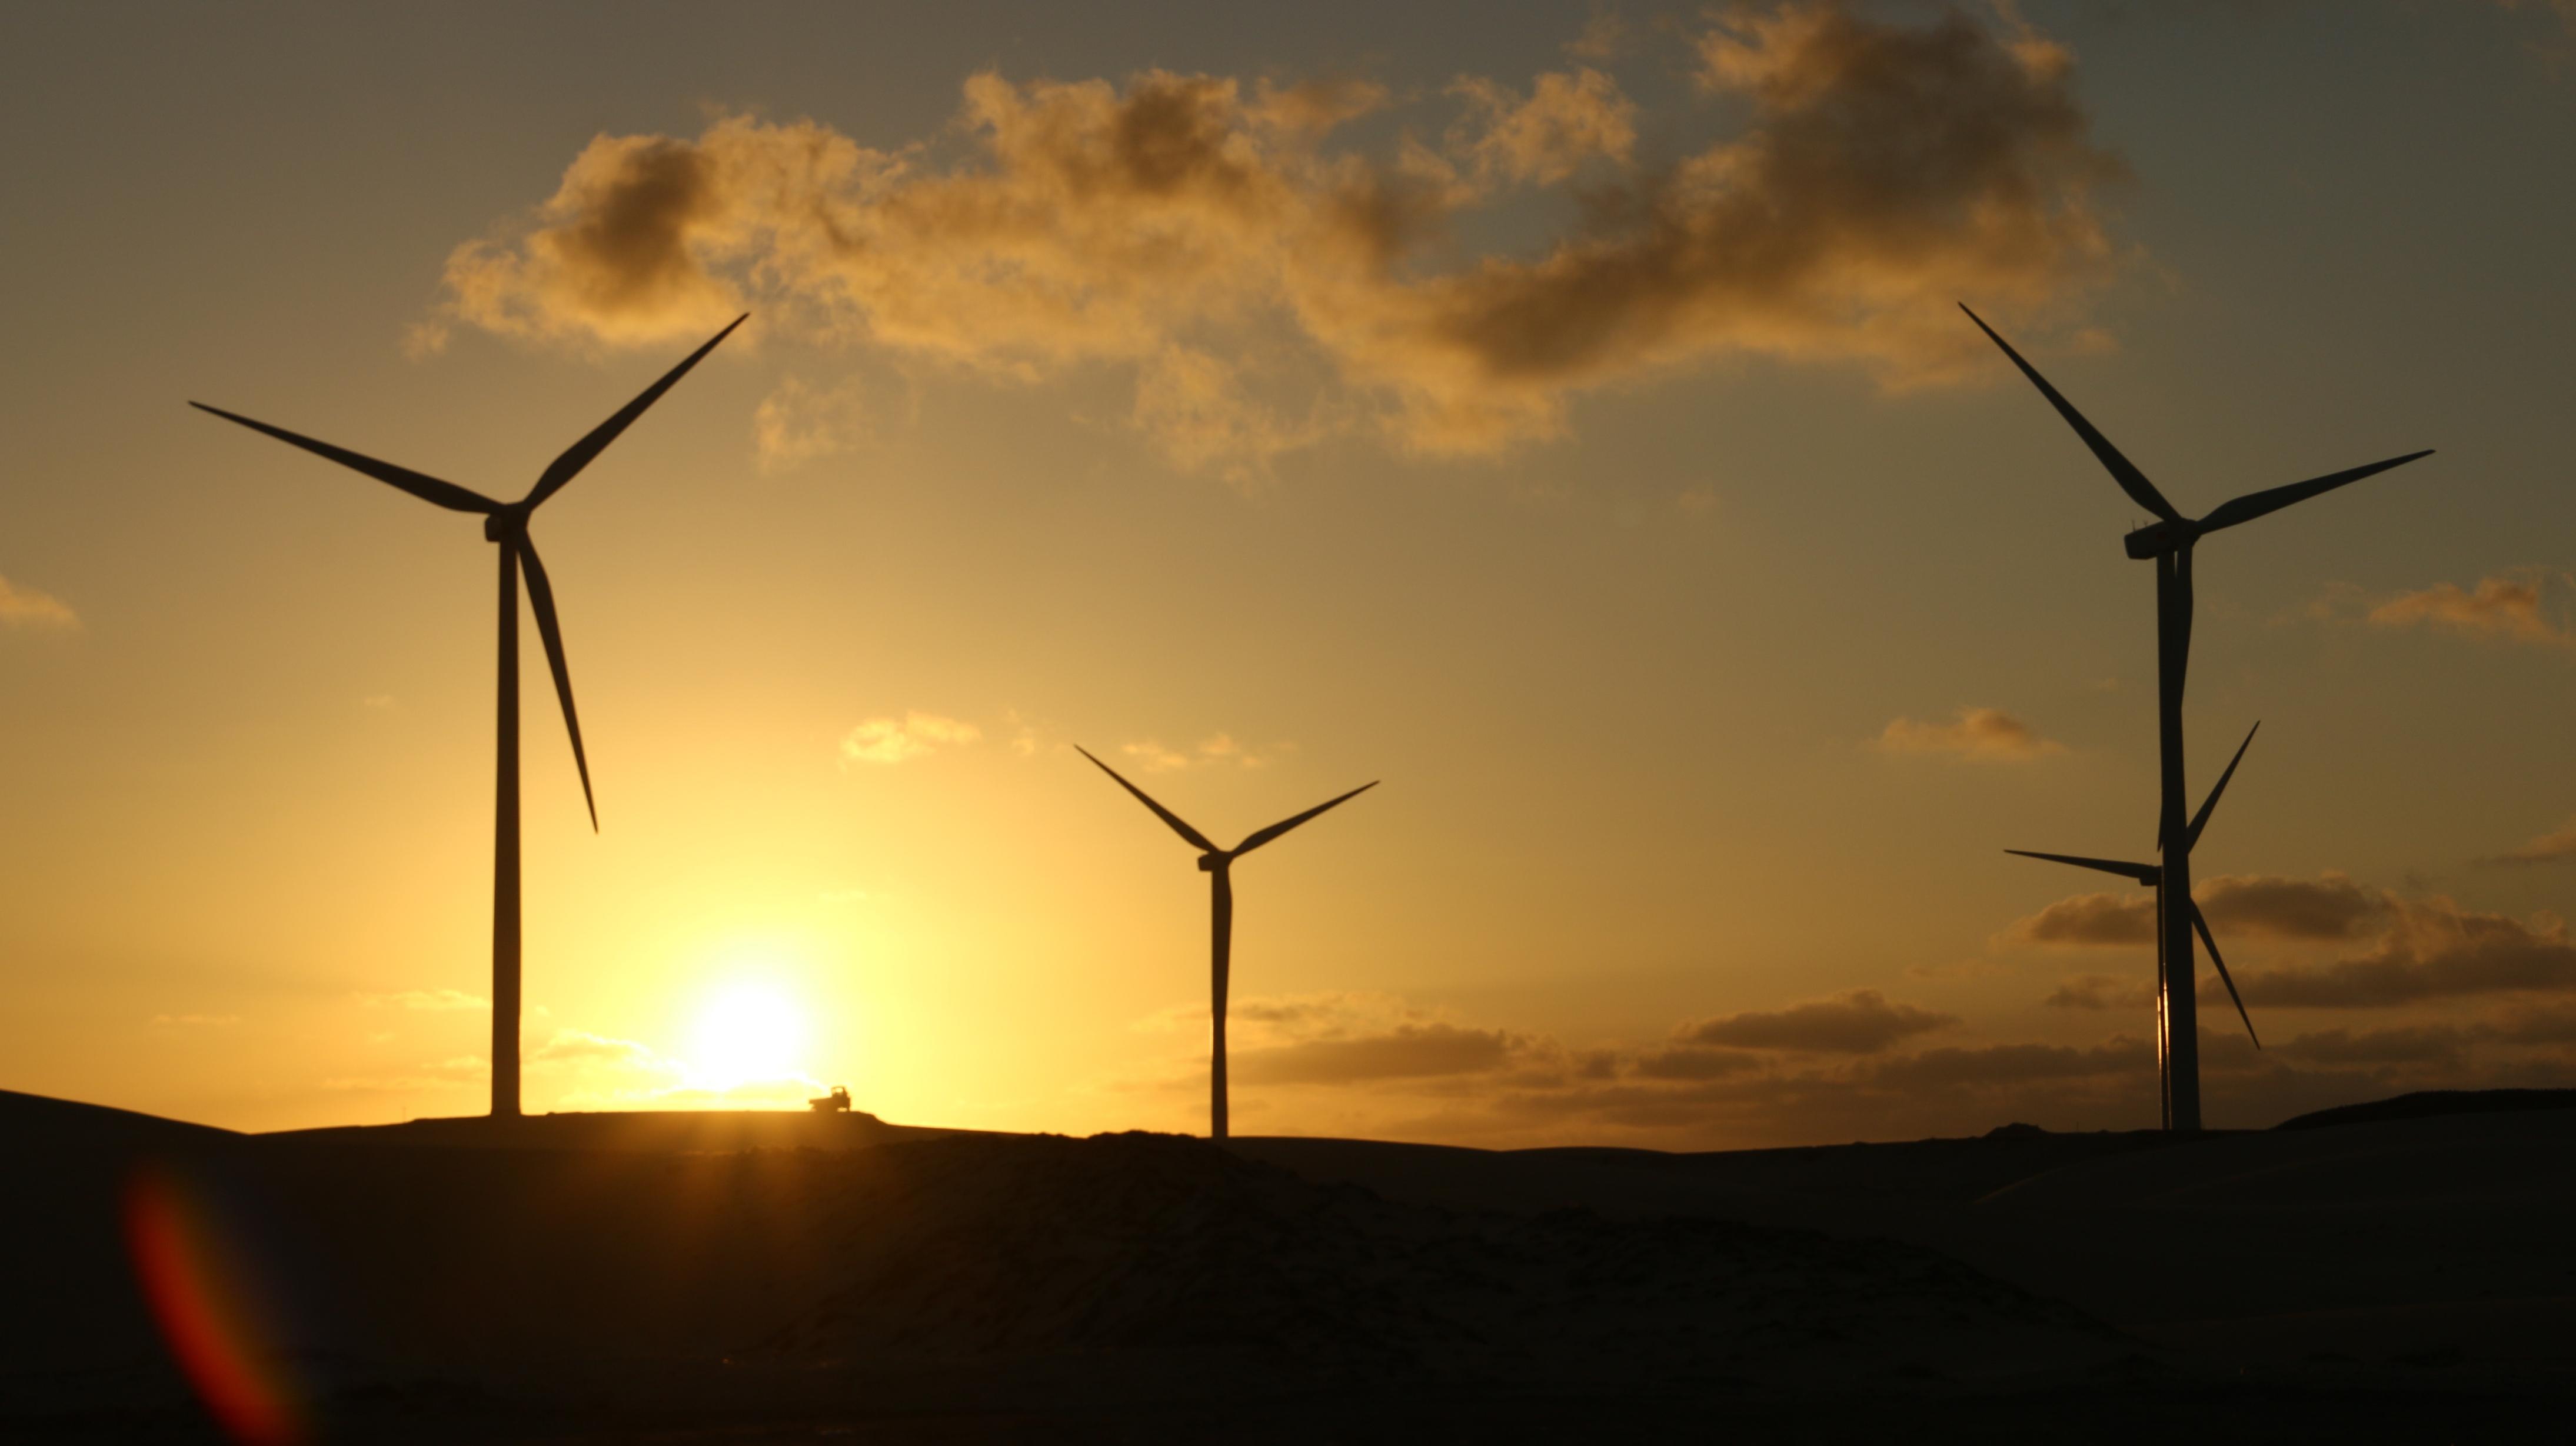 Gamesa-wind-farm-in-Brazil Gamesa To Supply 136.5 MW In Brazil